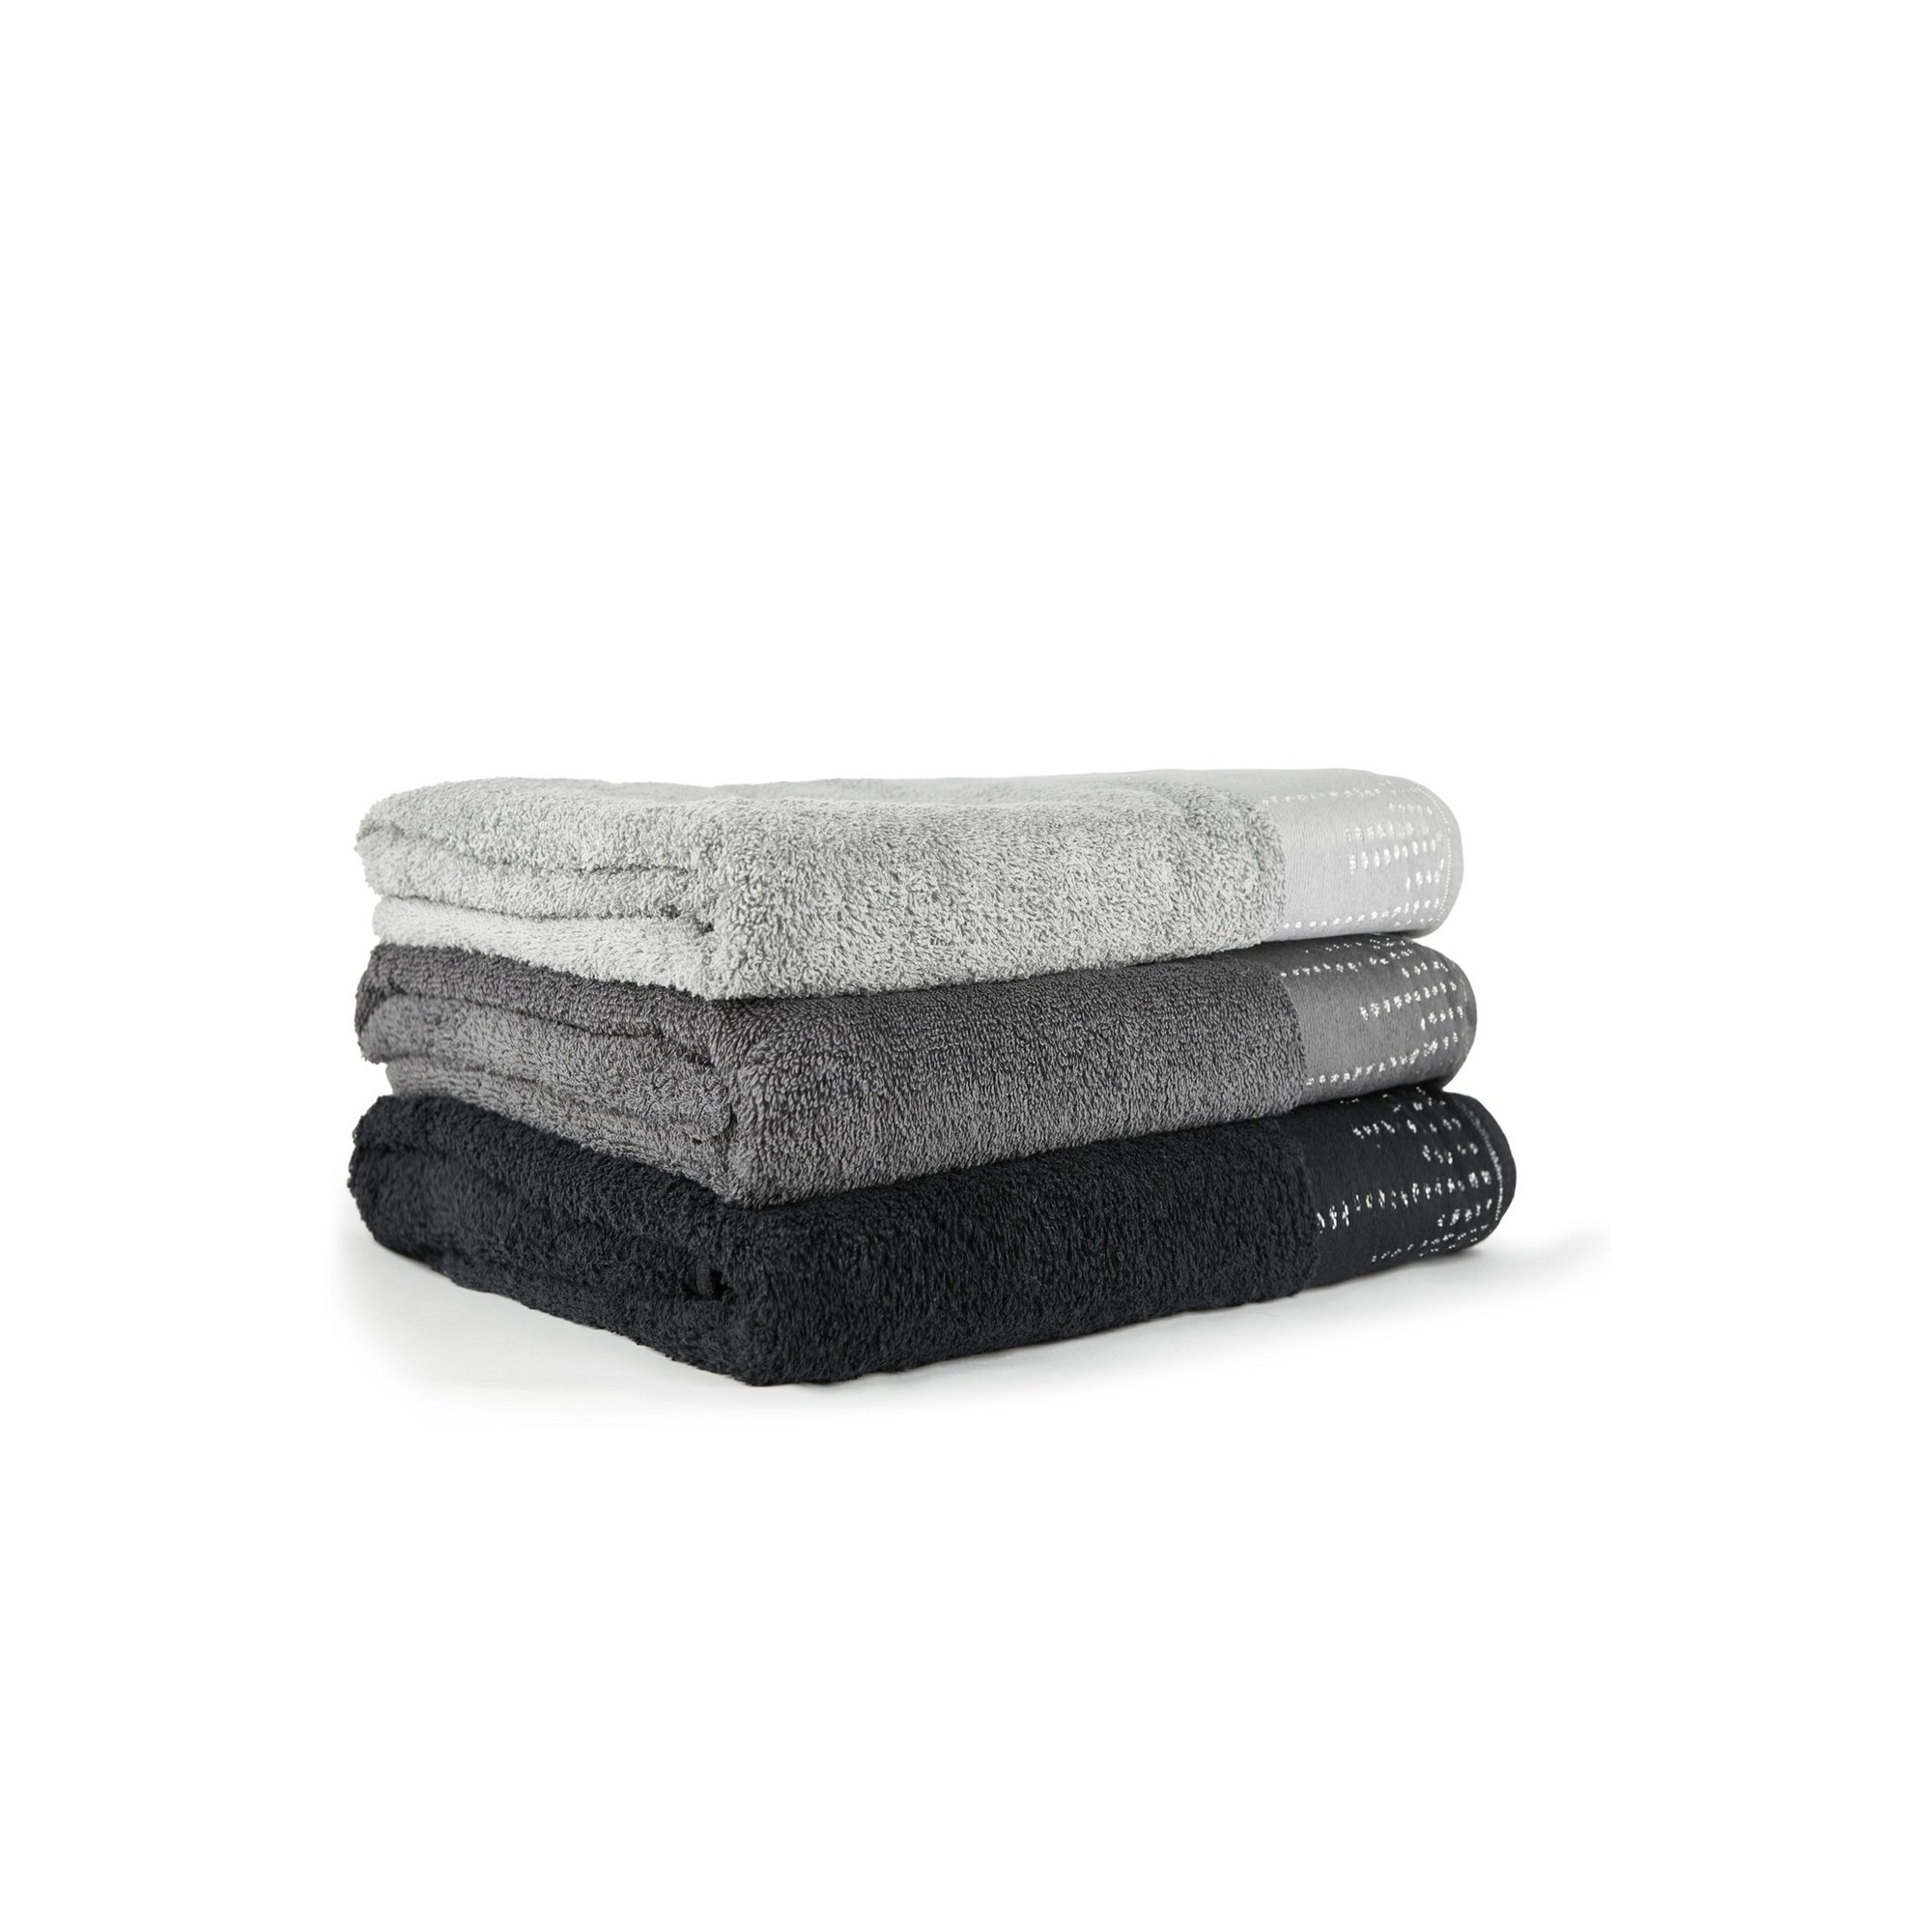 Image of Manhattan Towel with Metallic Border 4 Piece Bale